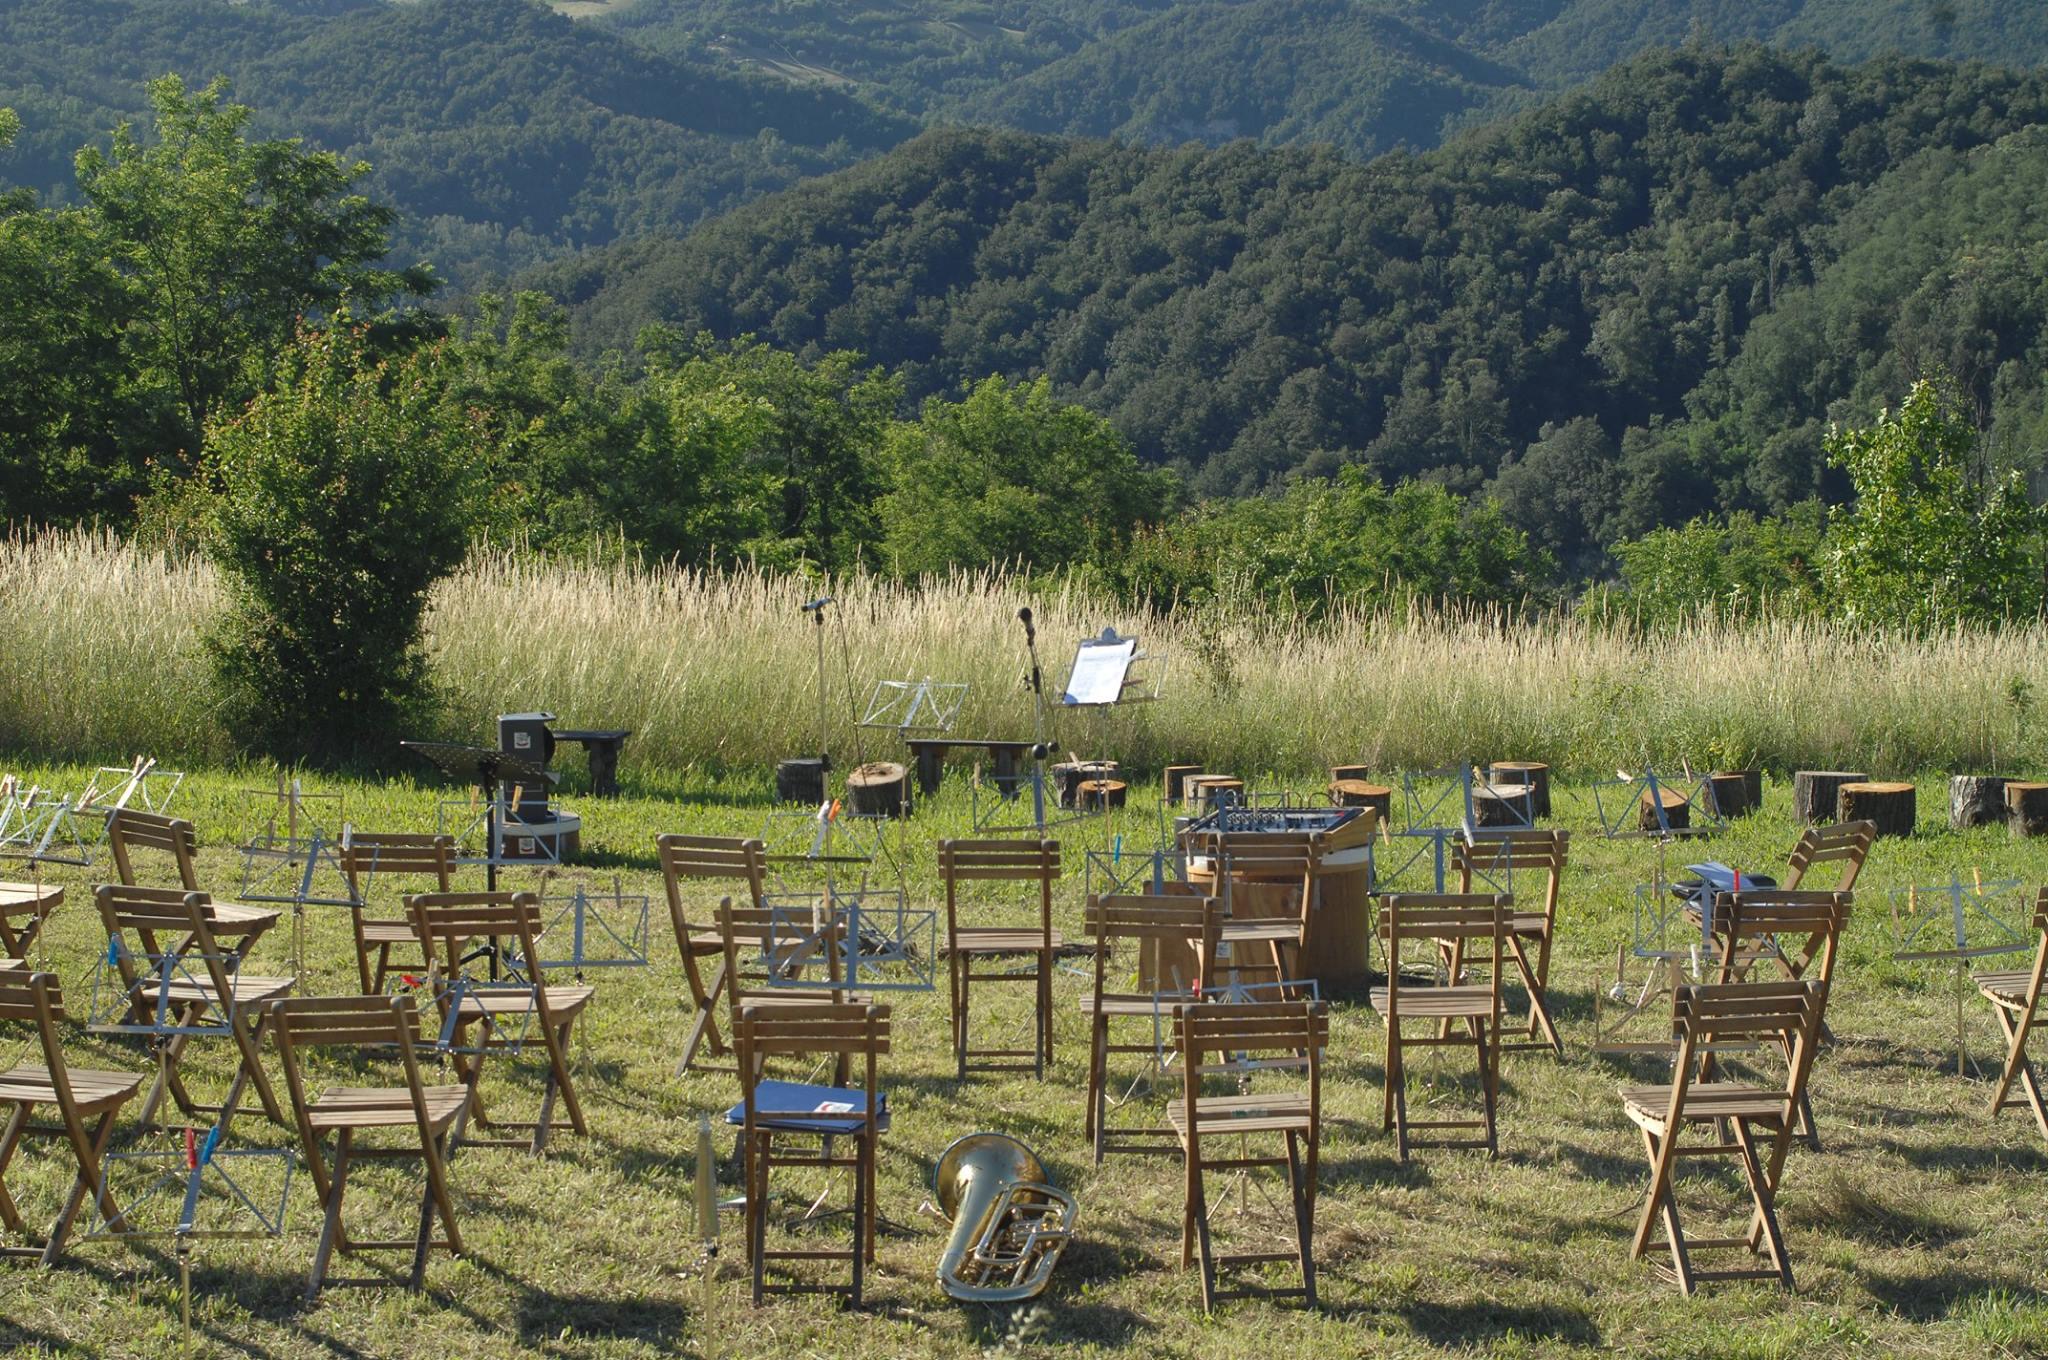 evento musicale a castel merlino, monzuno